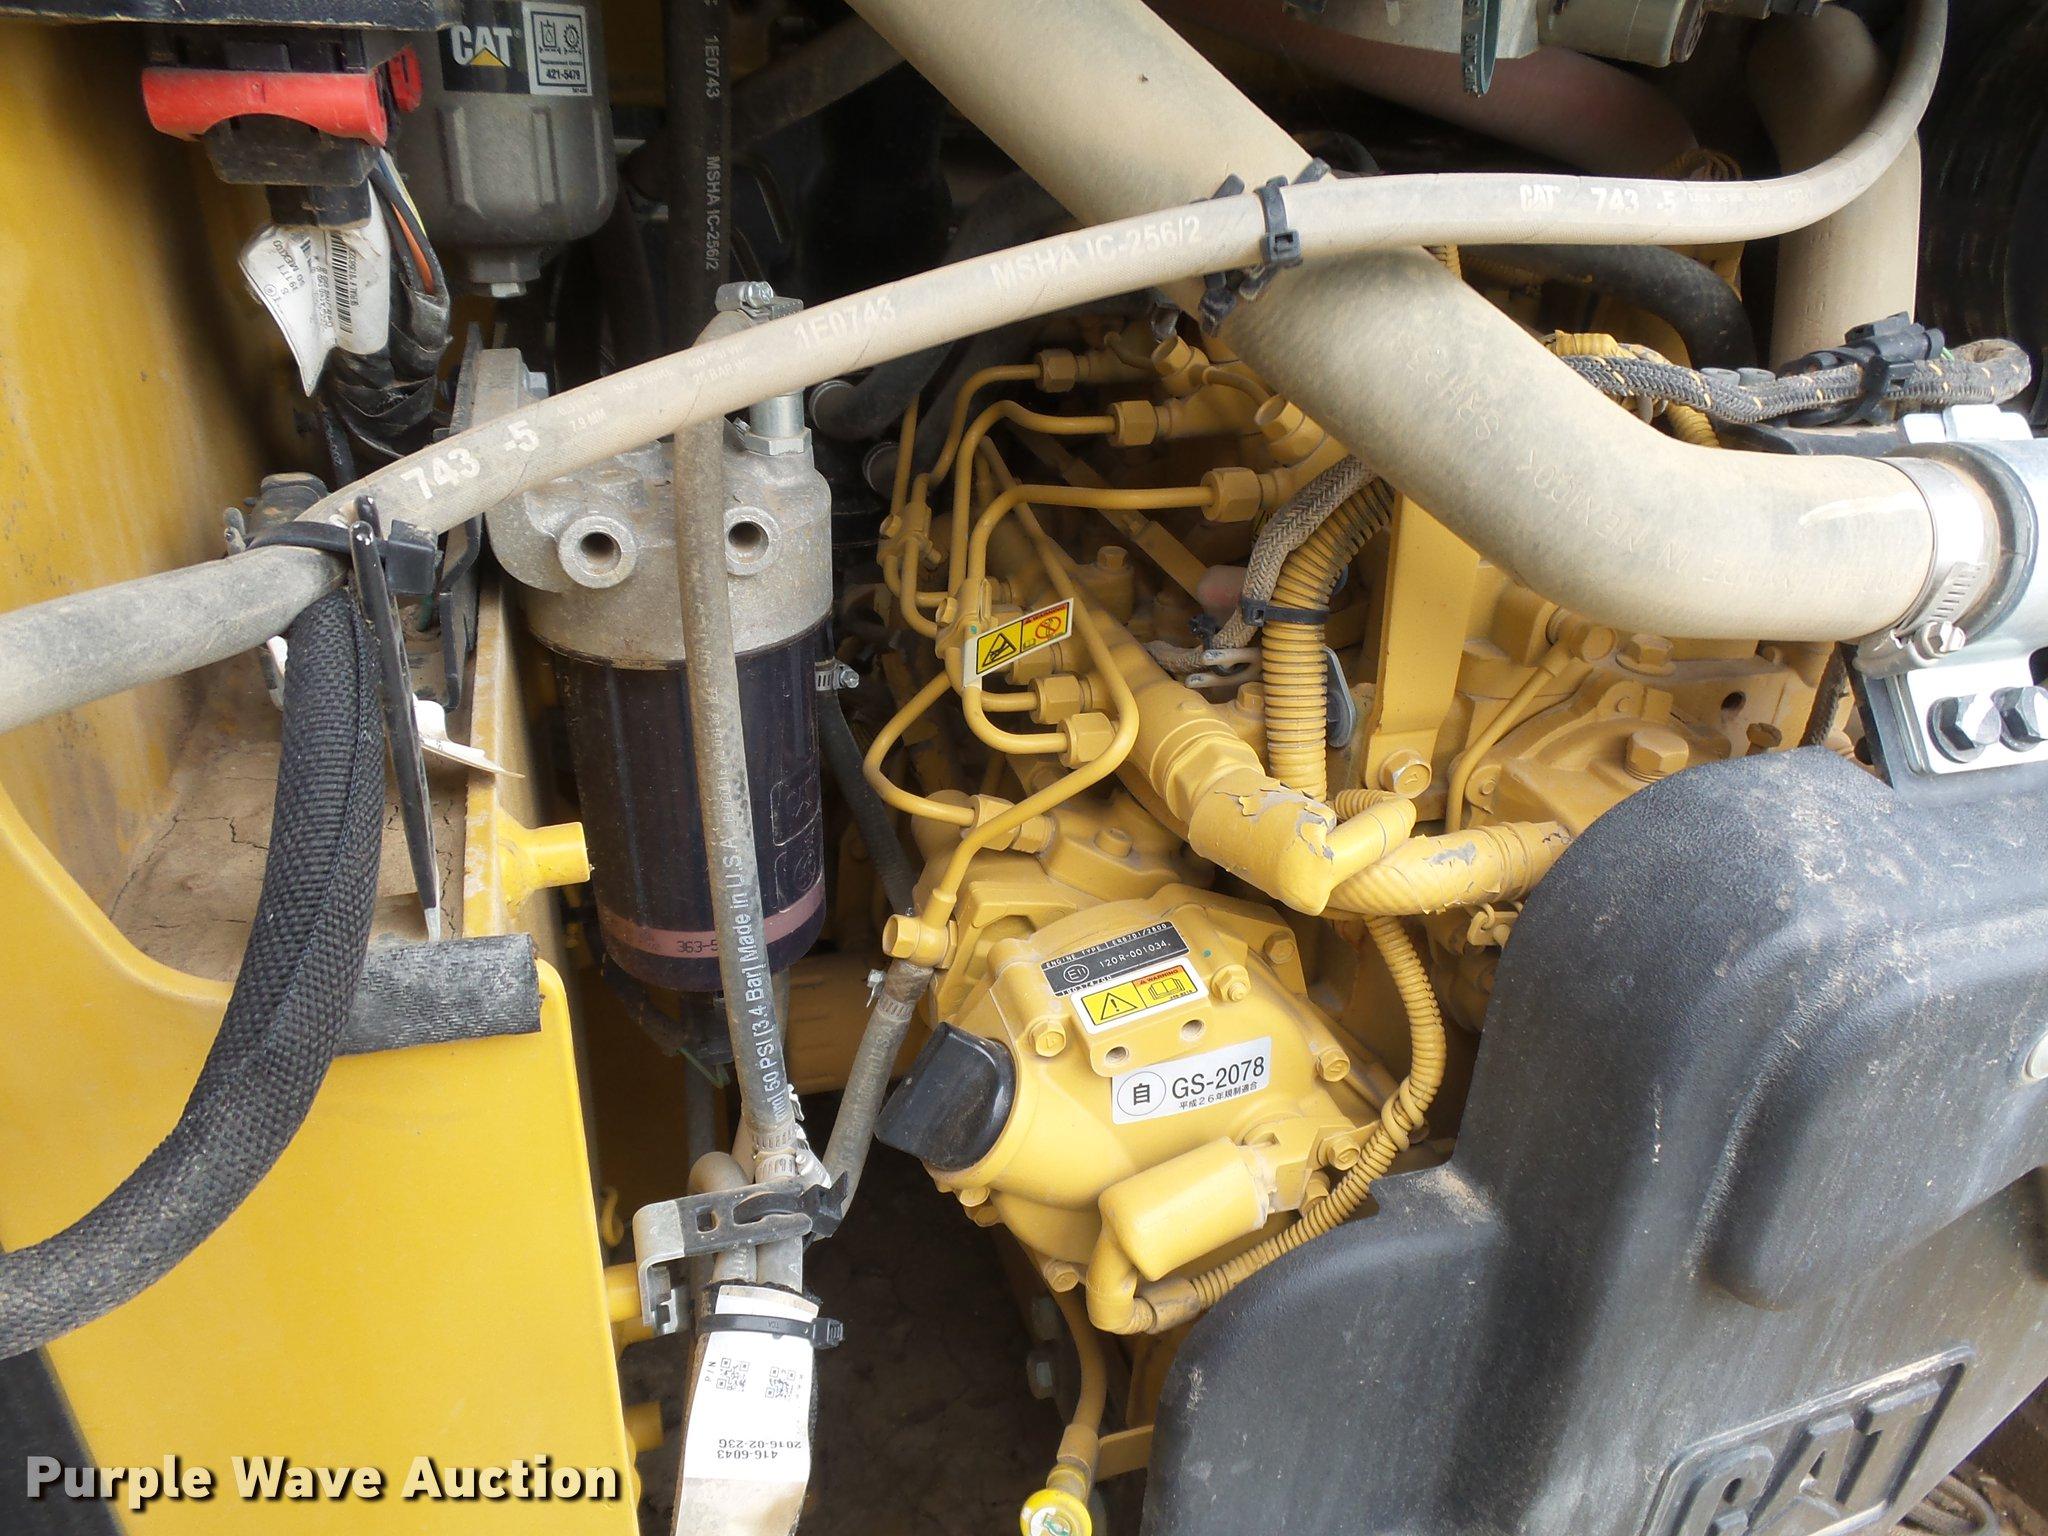 2016 Caterpillar 239D skid steer | Item DC3784 | SOLD! Novem